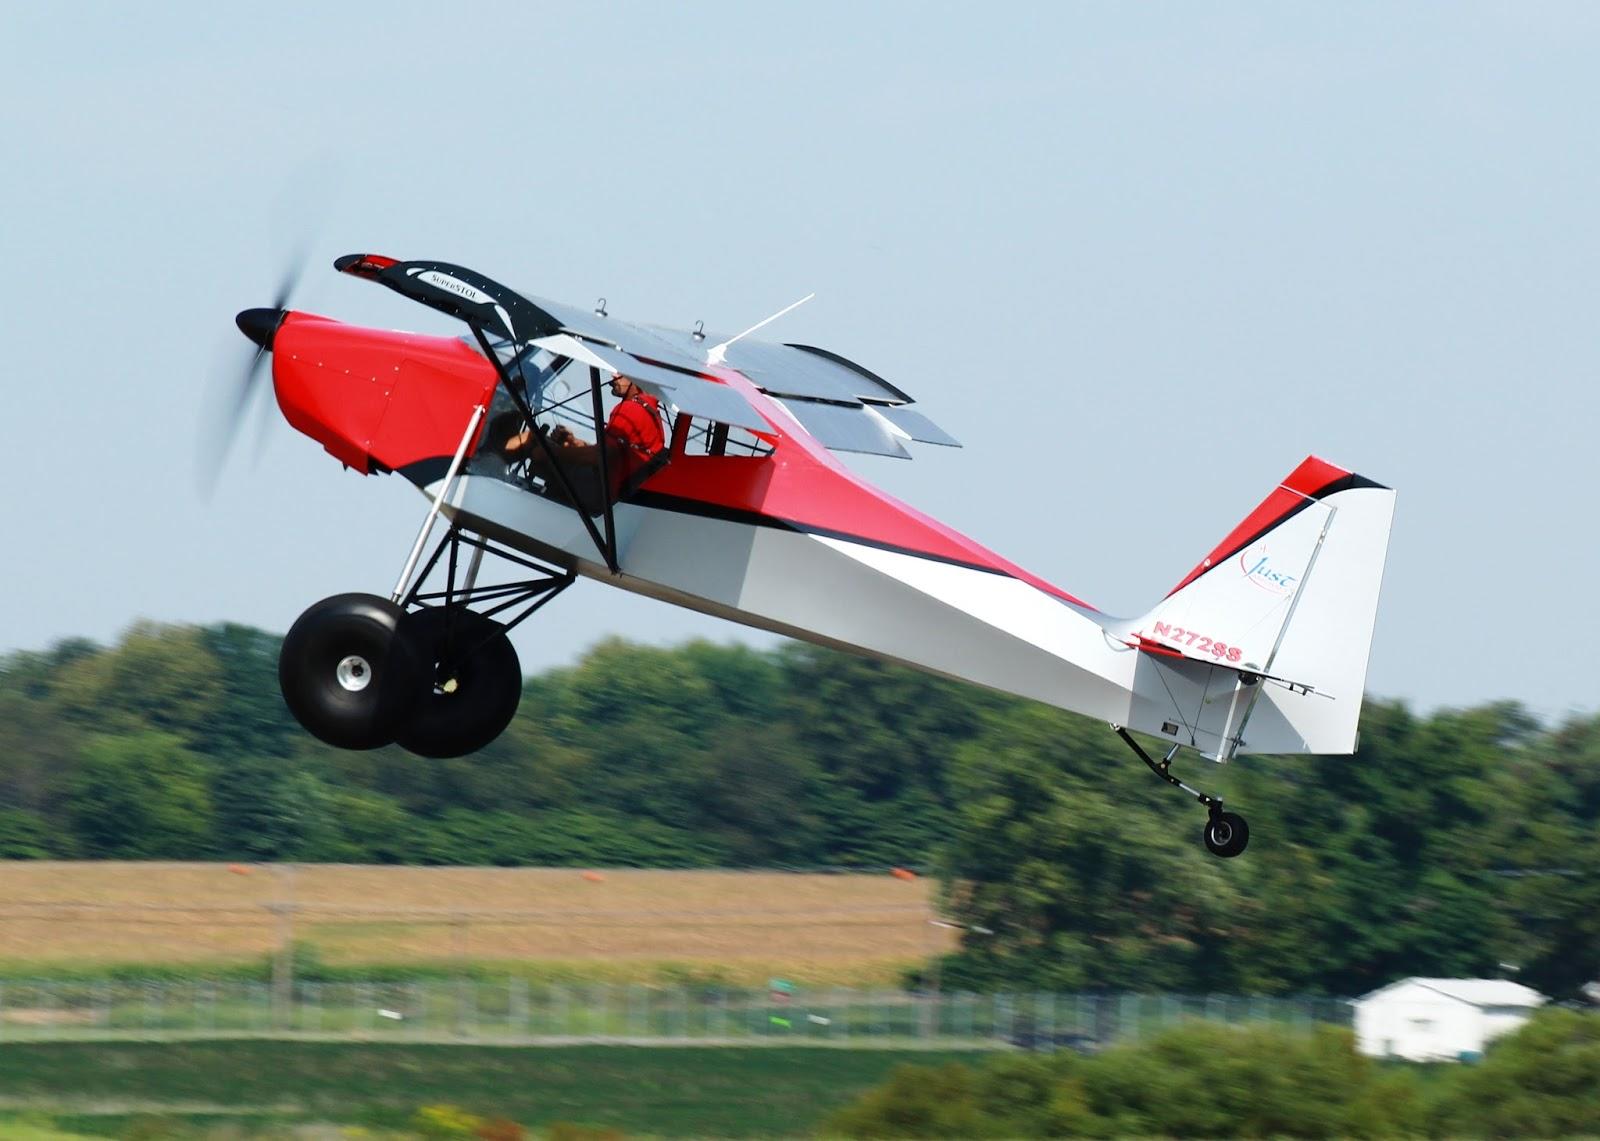 PLANE & PILOT MIDWEST LSA EXPO BRINGS LIGHT SPORT AIRCRAFT